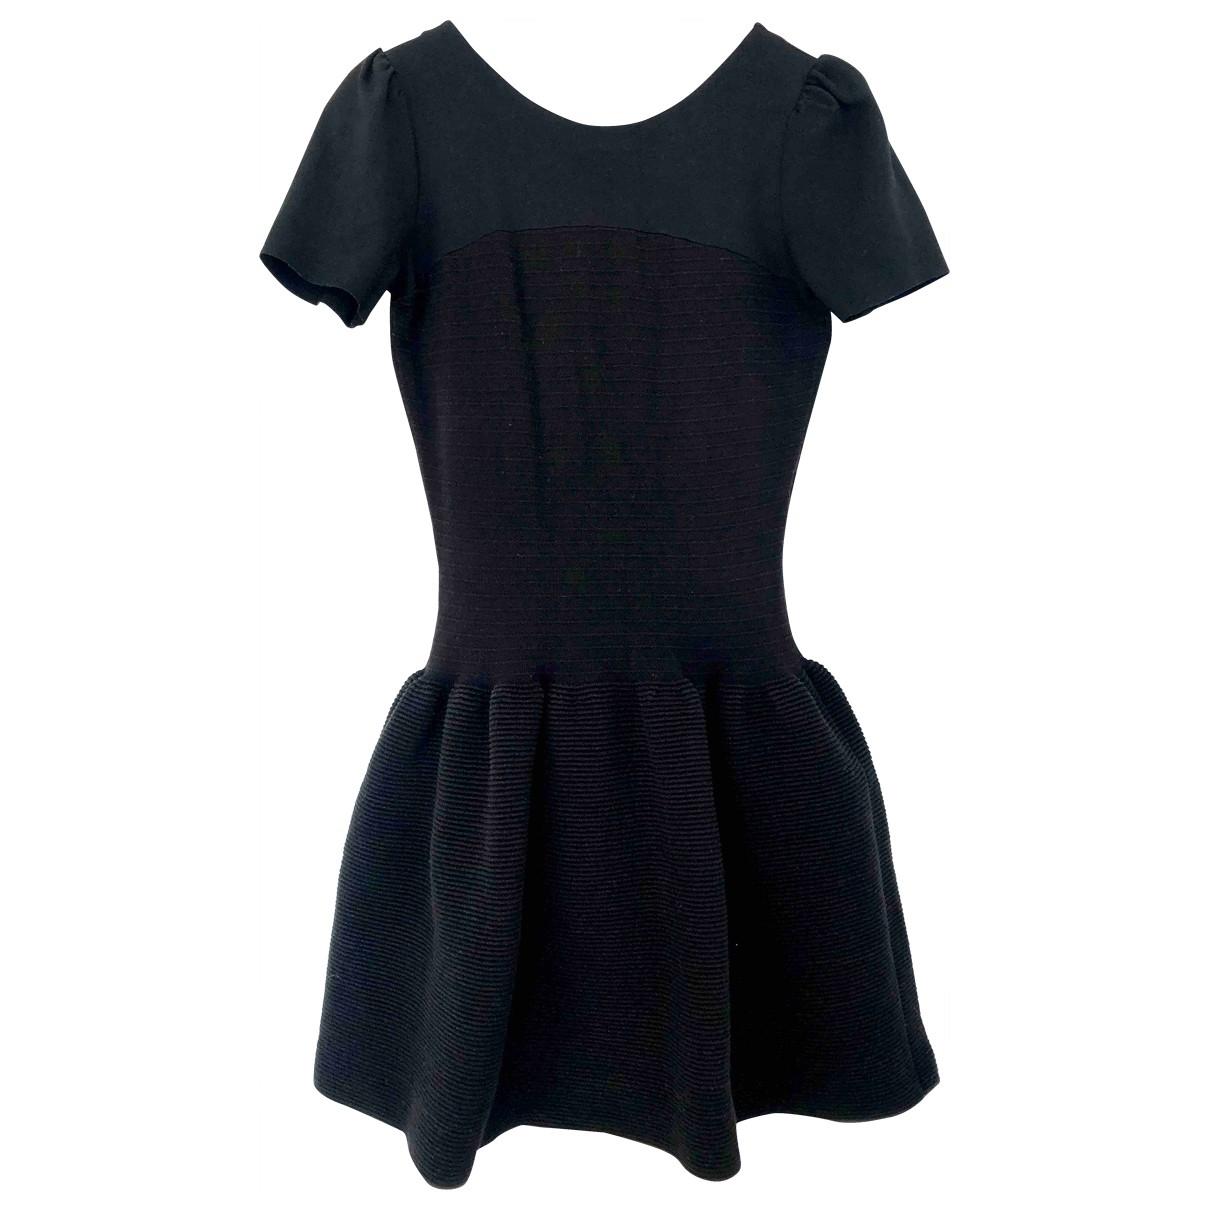 Maje \N Black Cotton - elasthane dress for Women M International